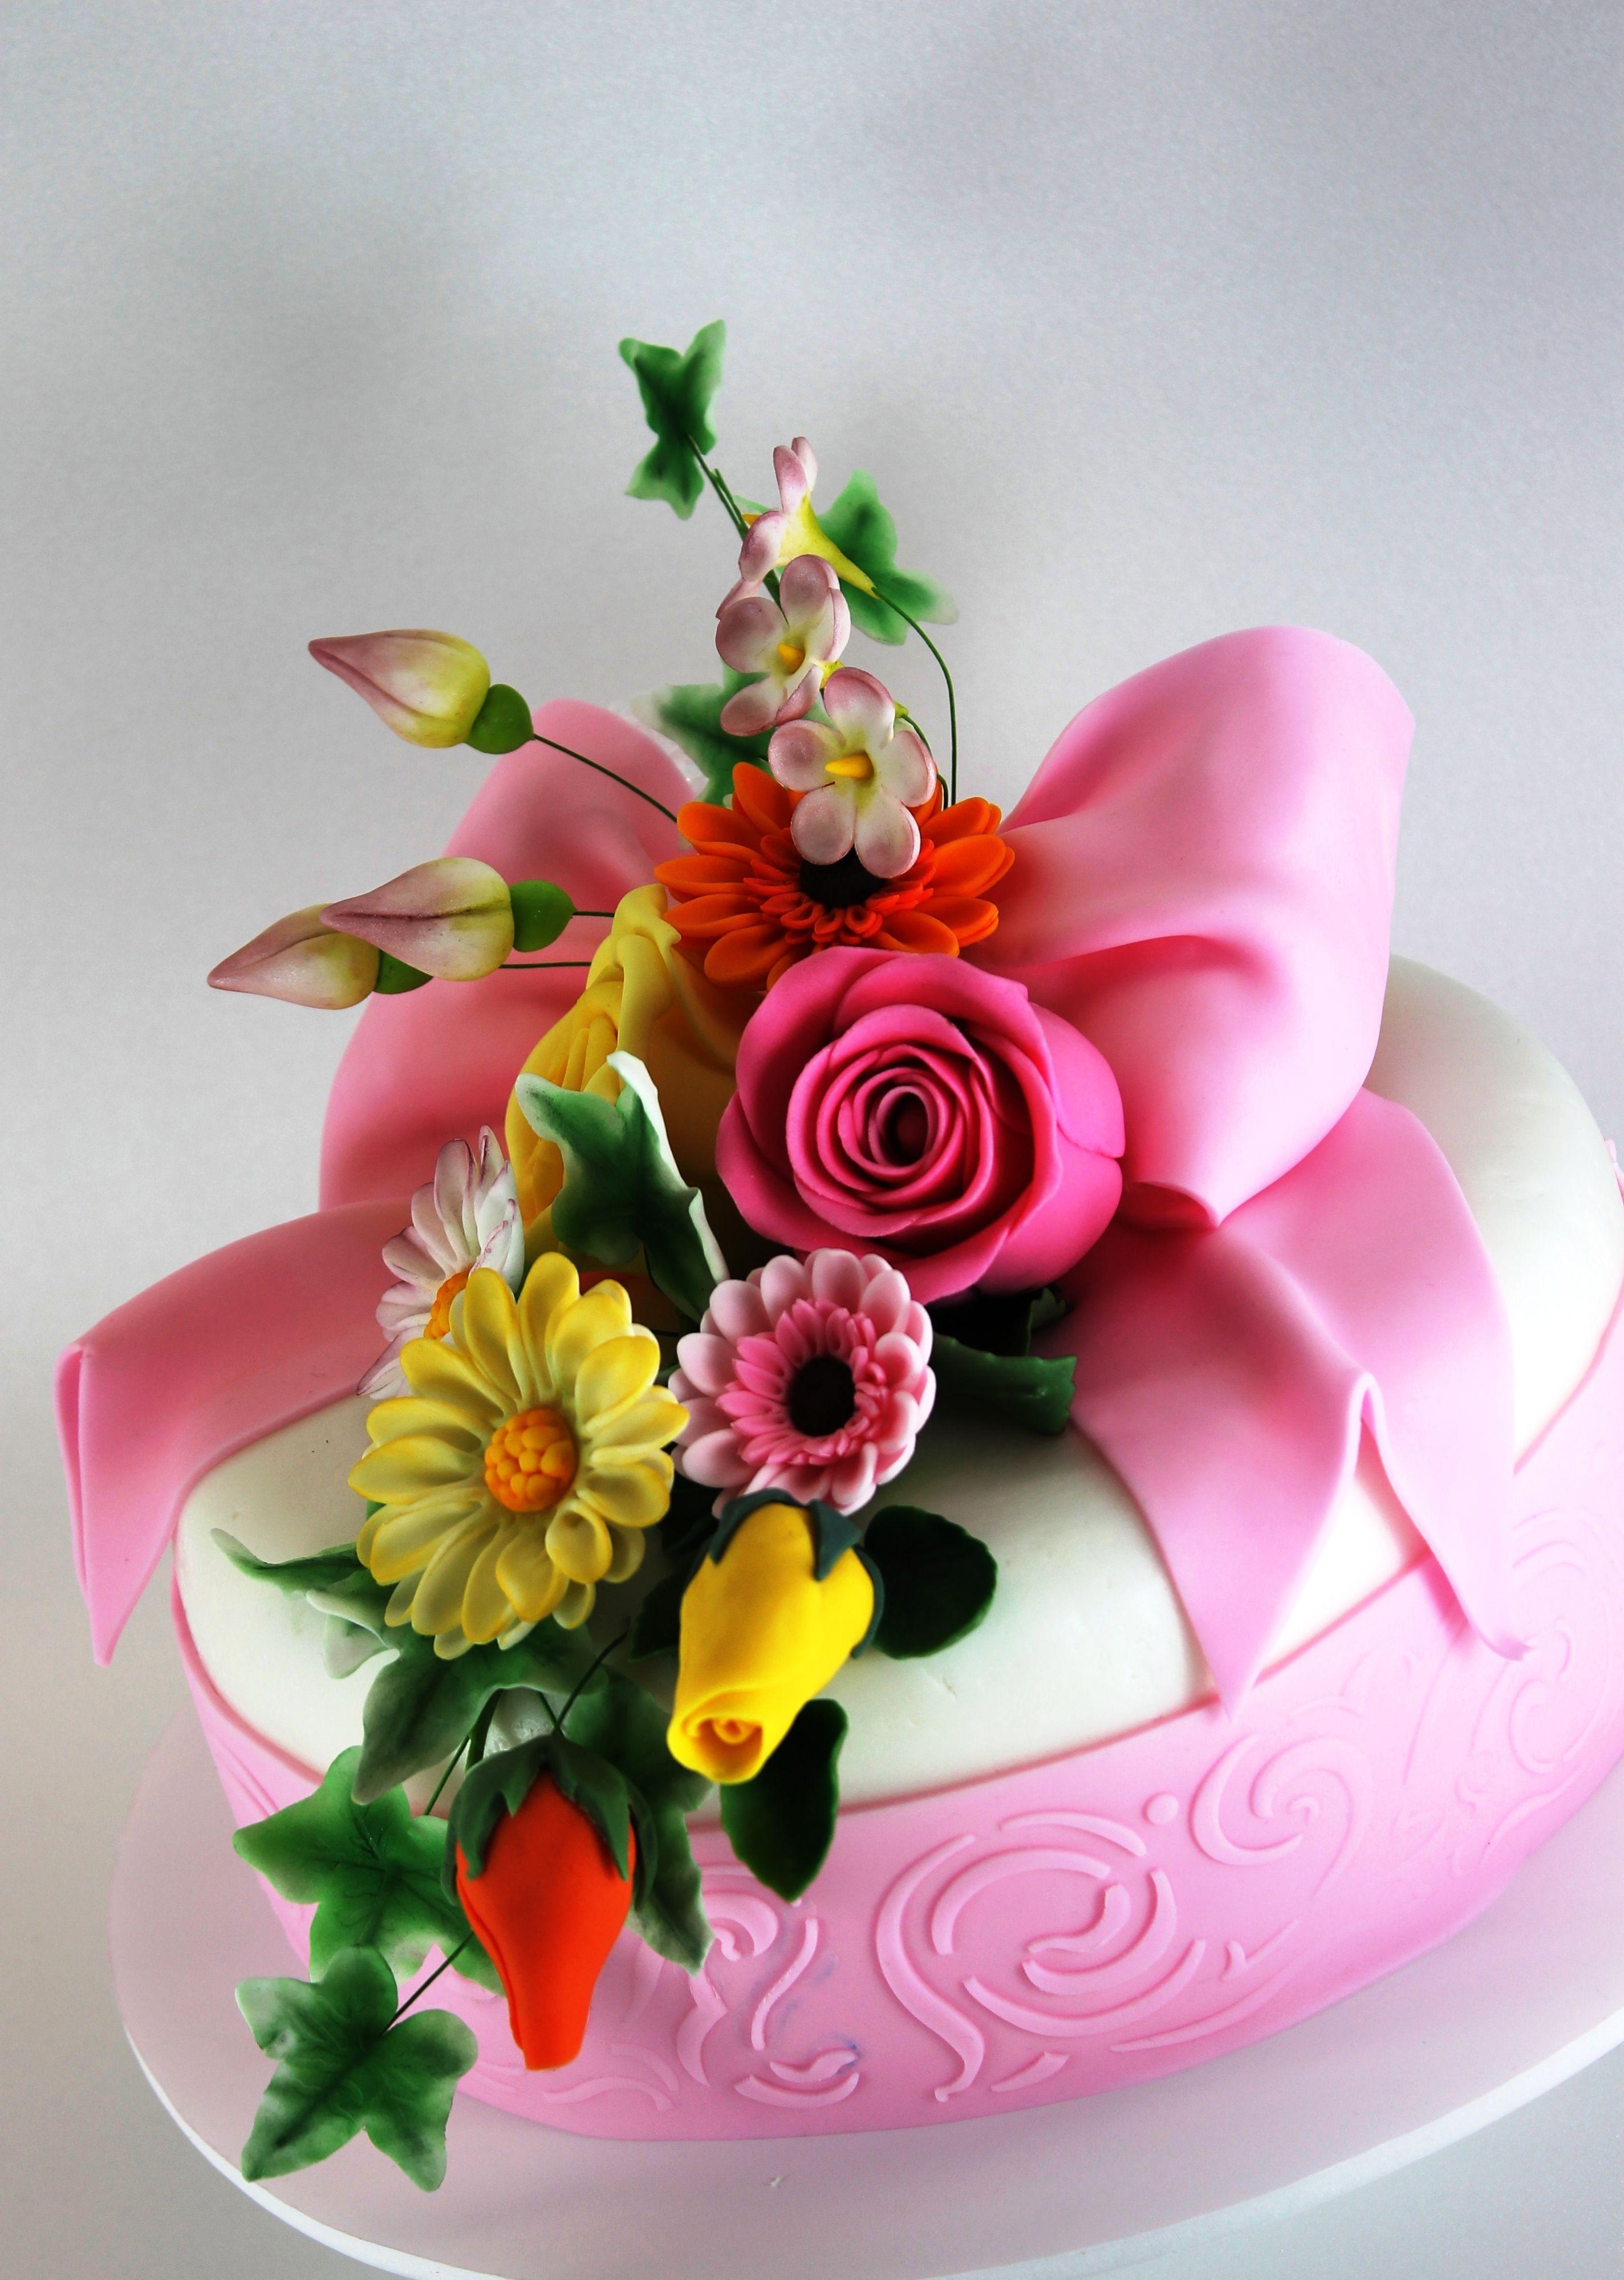 Beautiful Birthday Cake Today December 27th Happy Birthday Mom